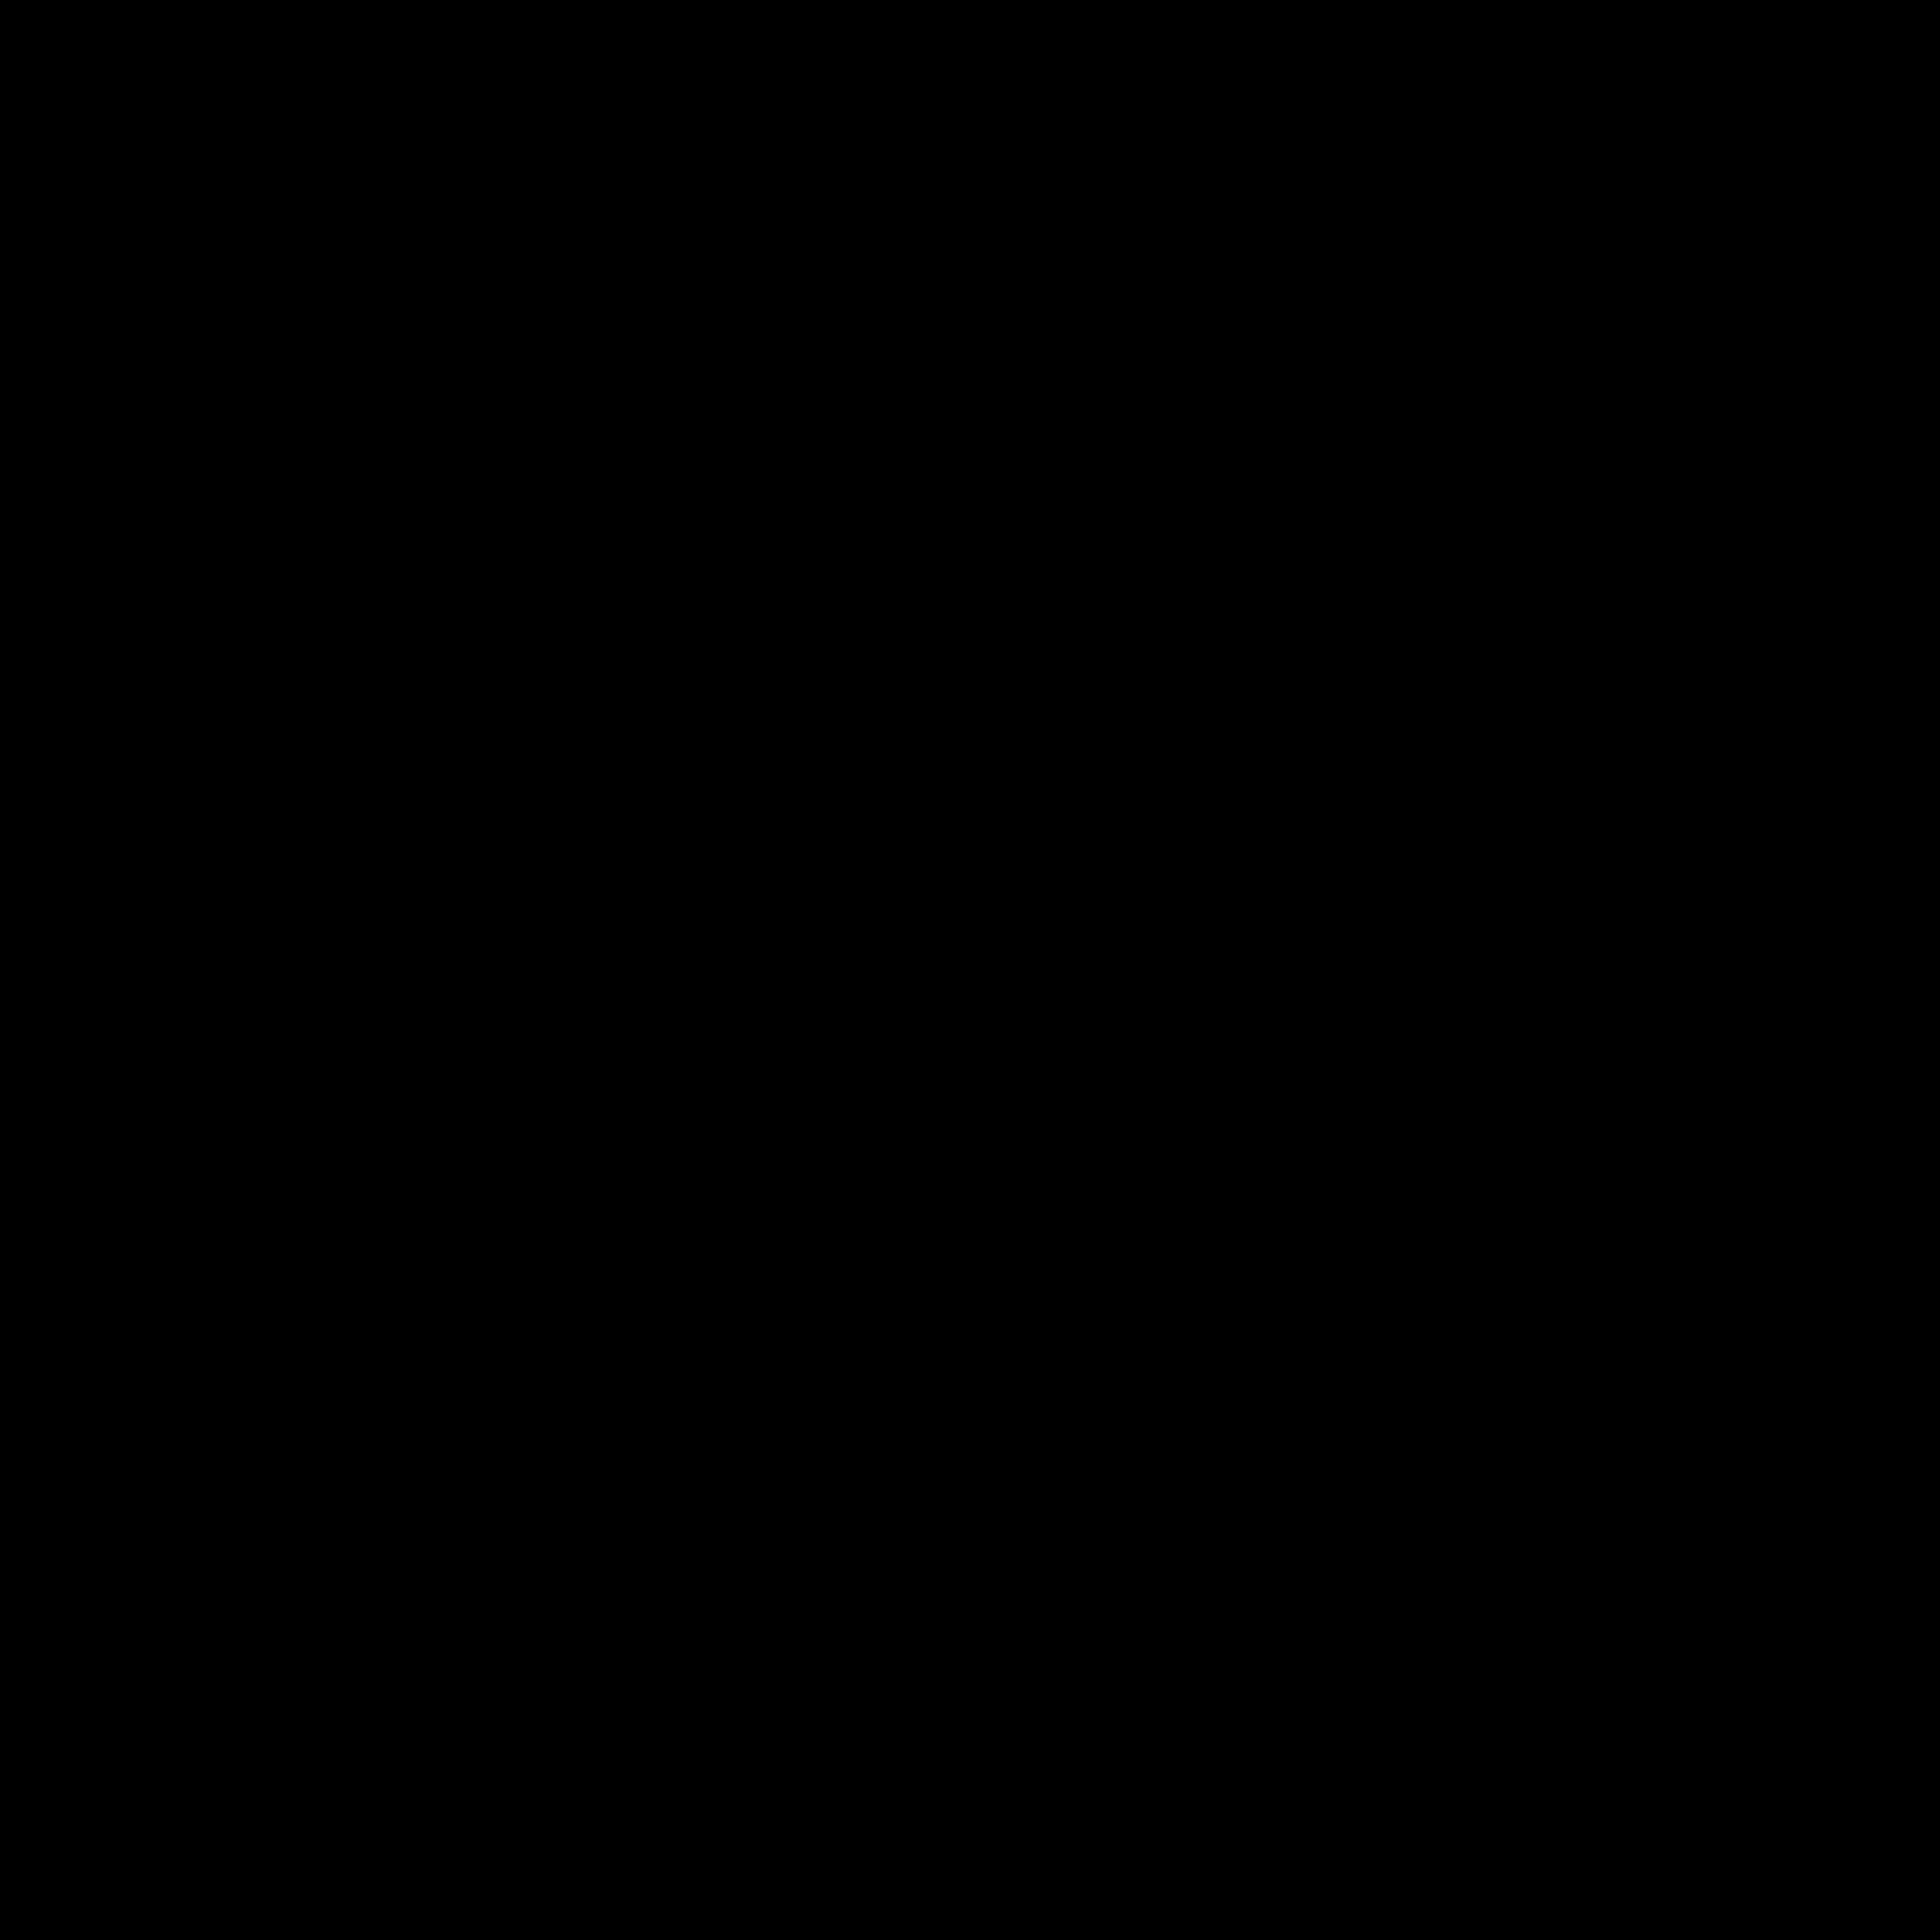 Divider clipart border. Decorative extrapolated big image